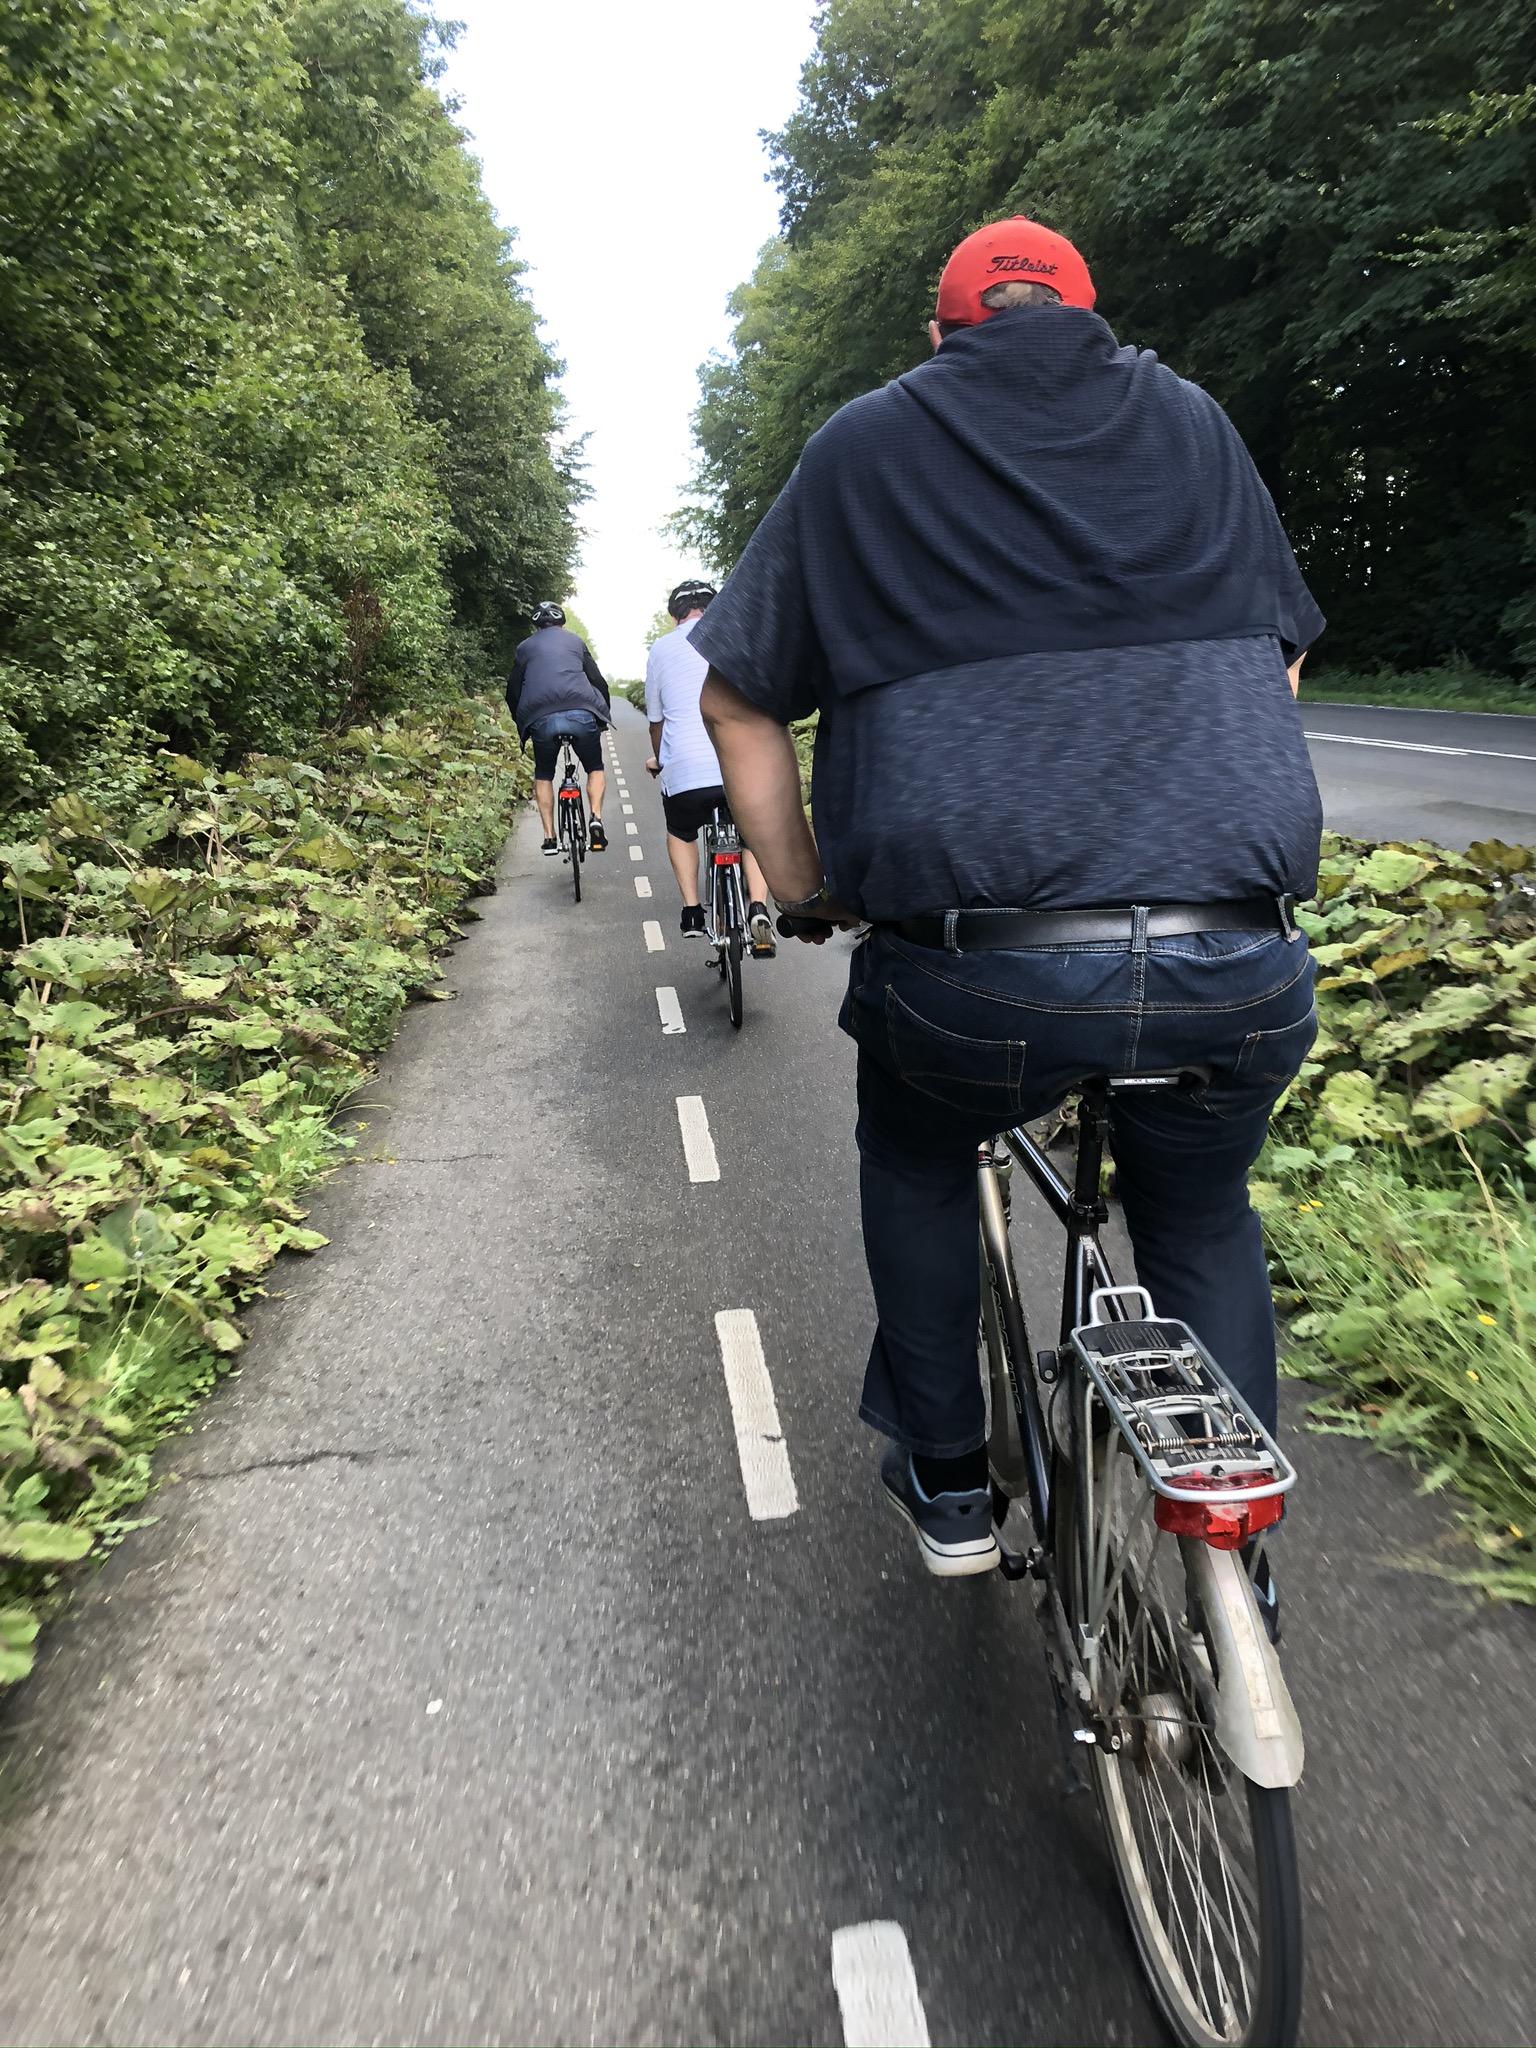 cykeltur mod vingård